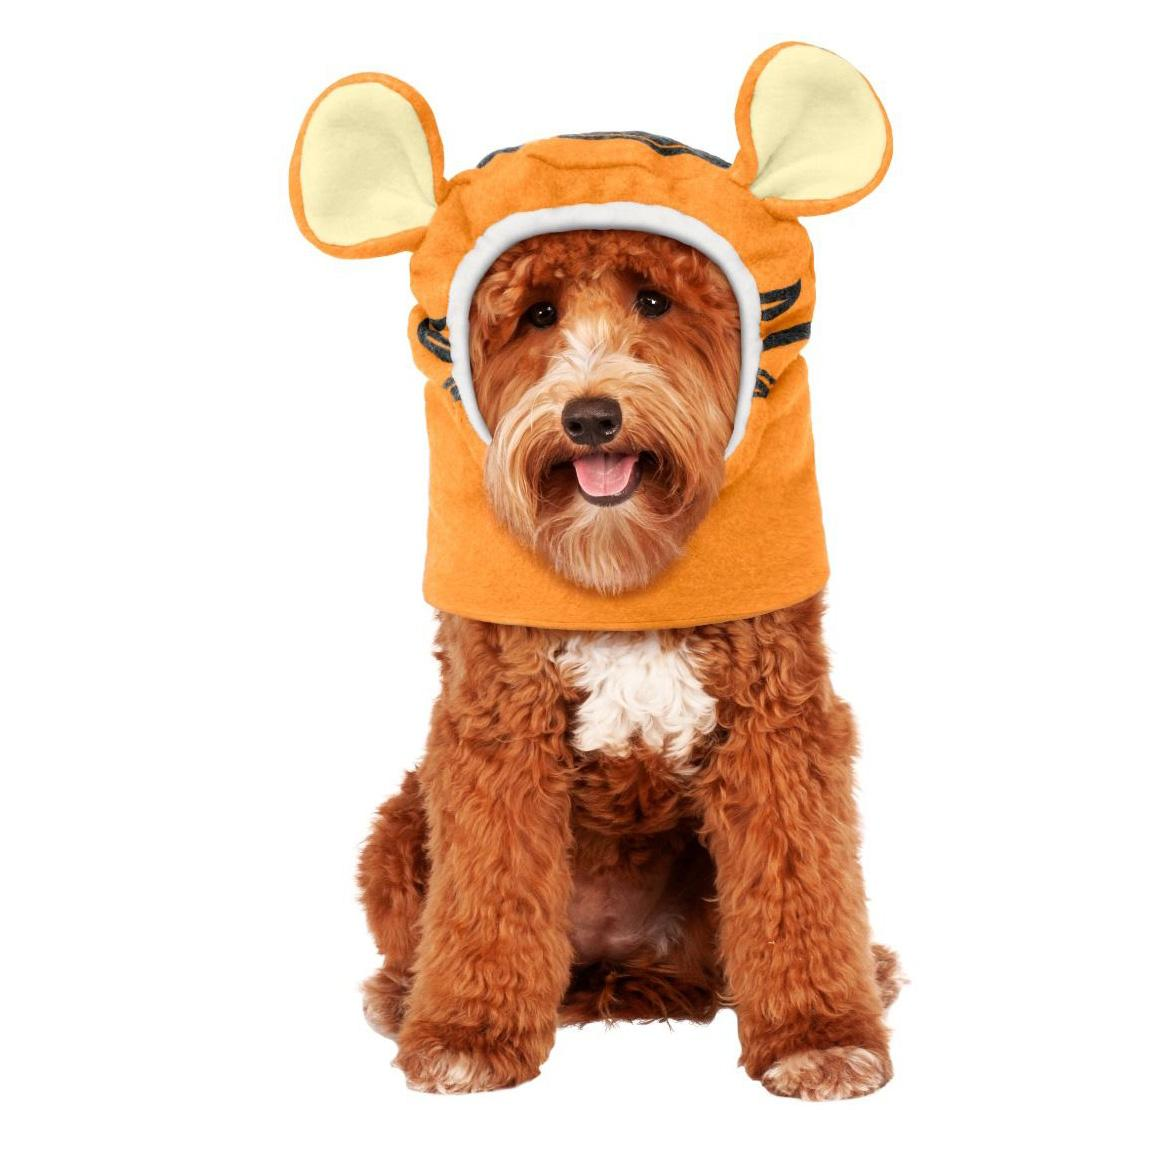 Winnie The Pooh Tigger Dog Costume Accessorie...